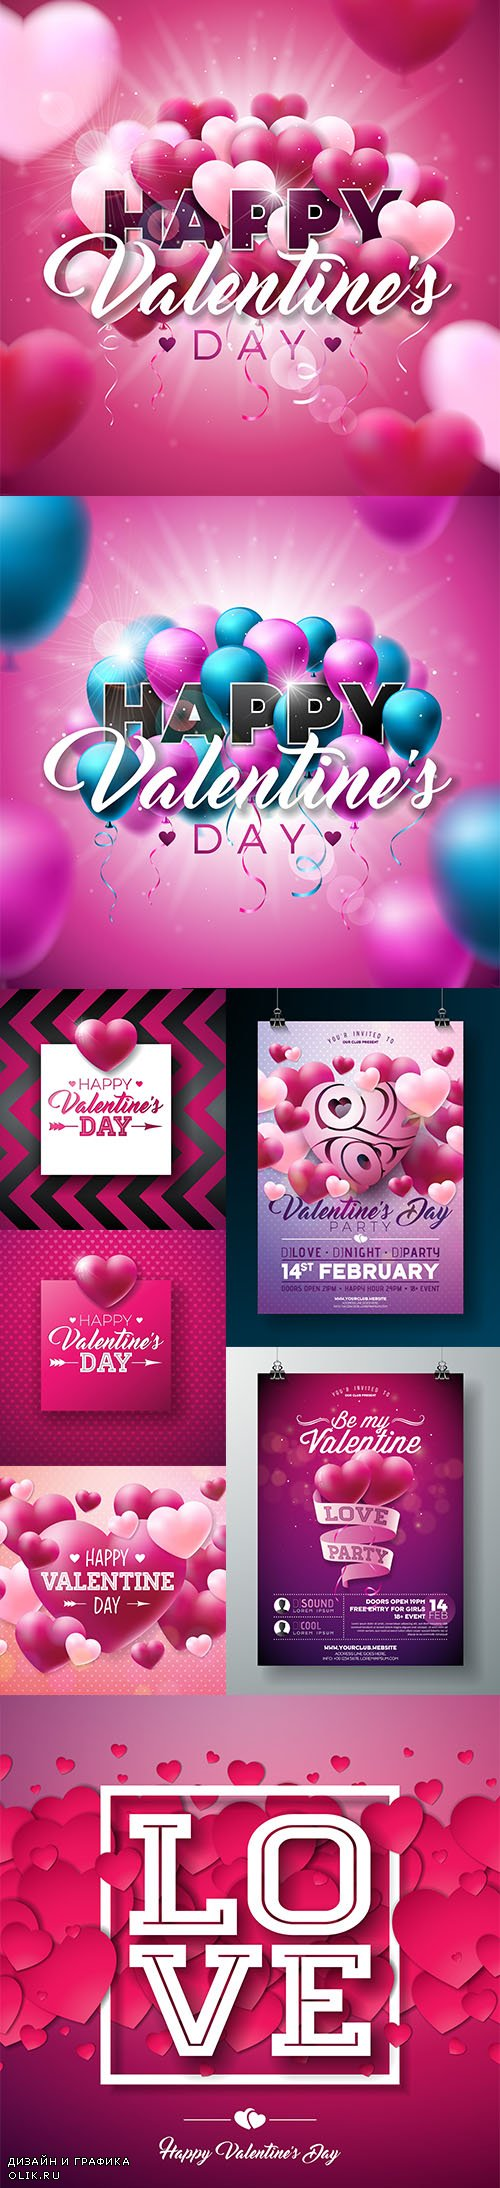 Romantic Valentines Day Premium Illustrations Vector Set